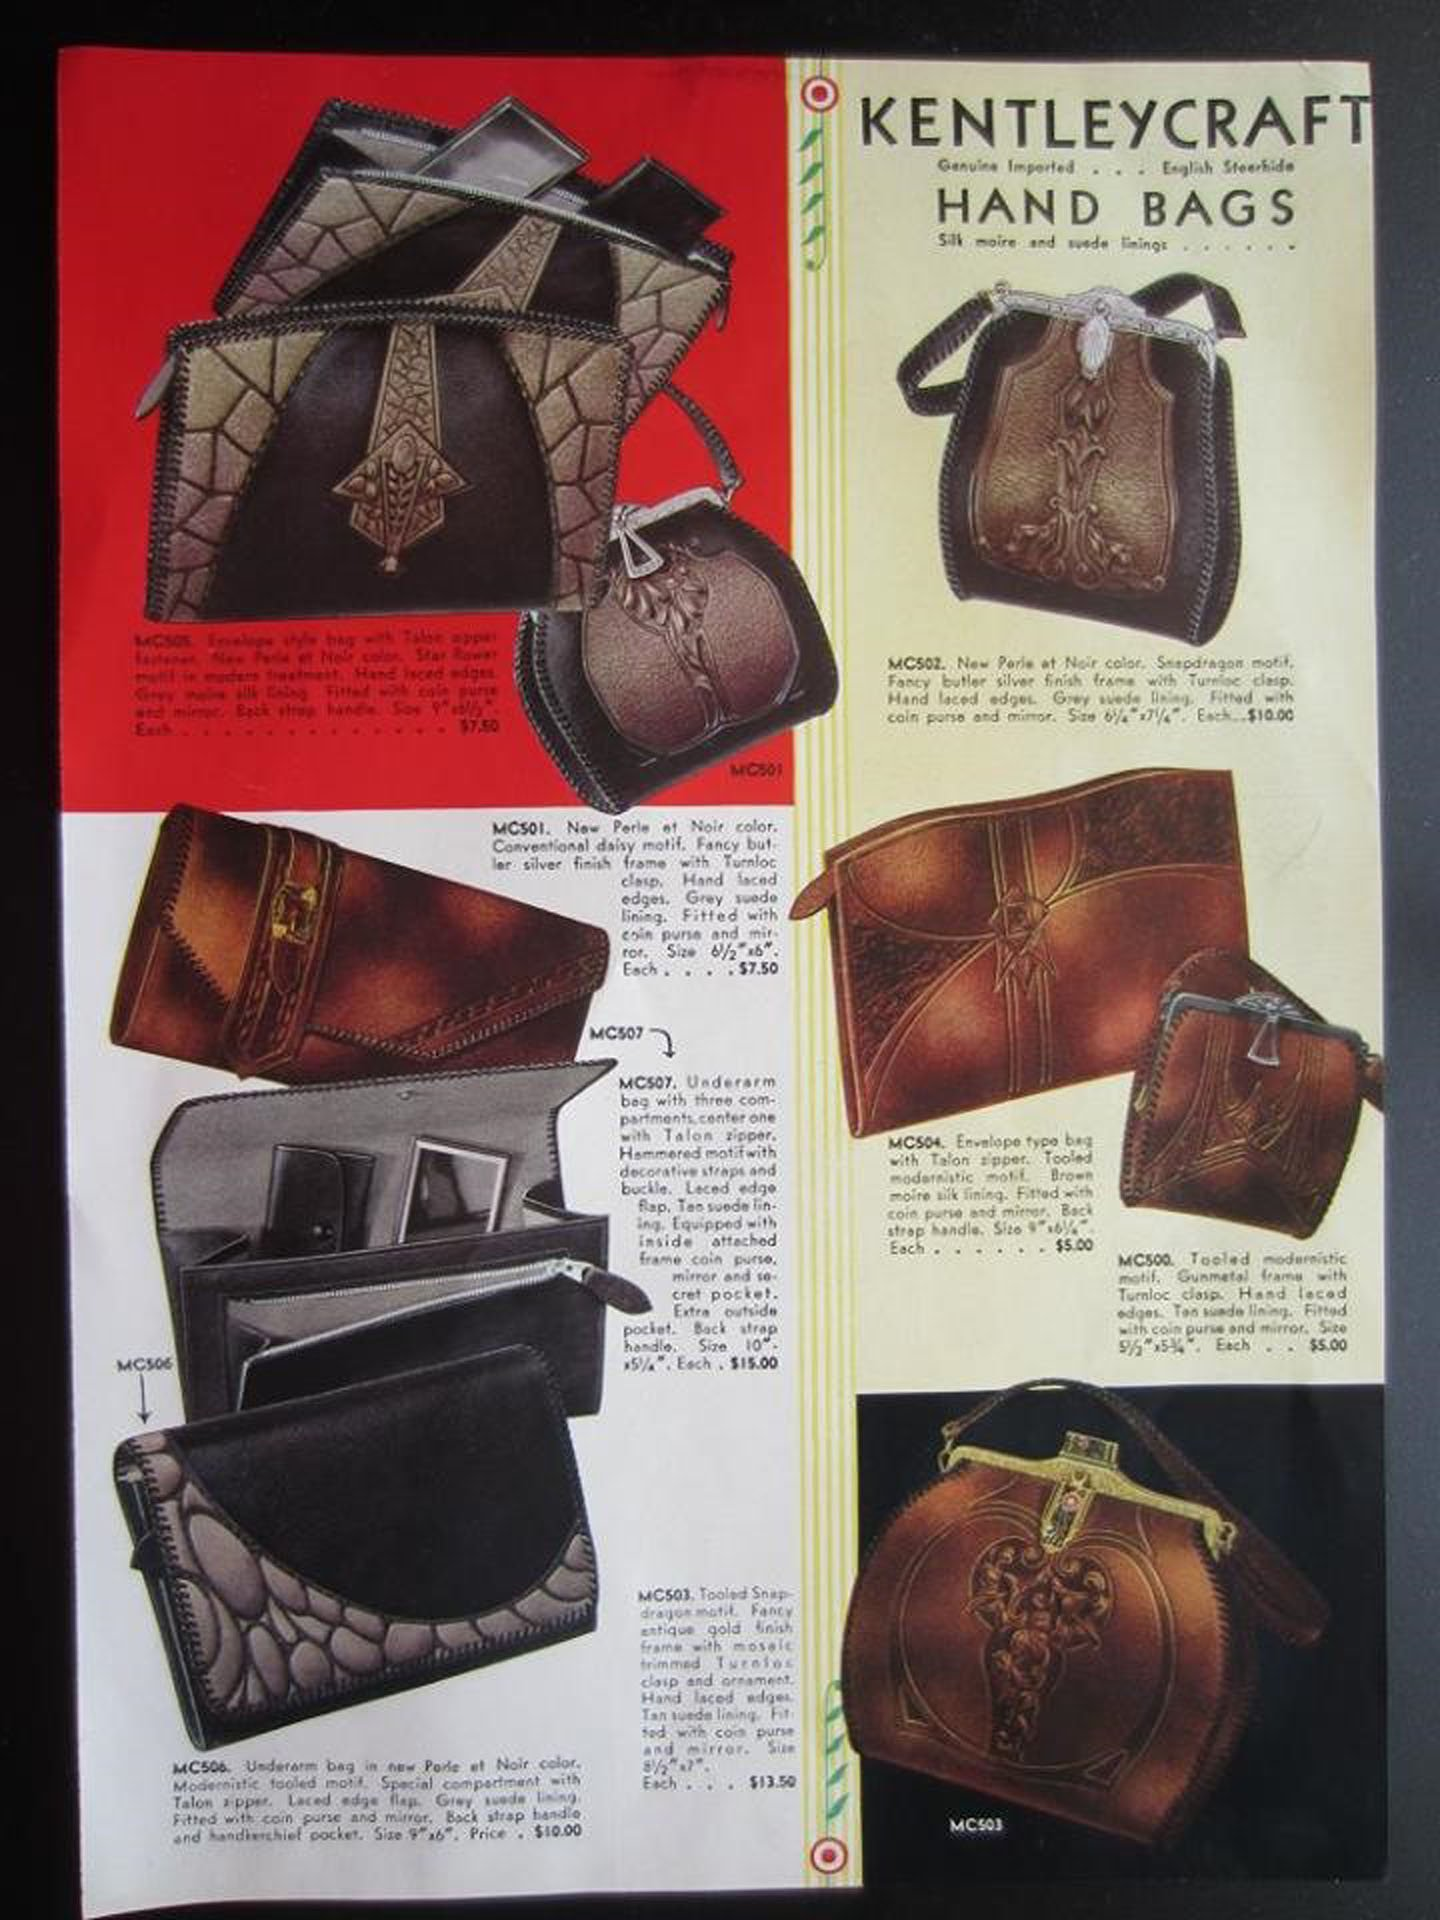 1933 Kentleycraft ad